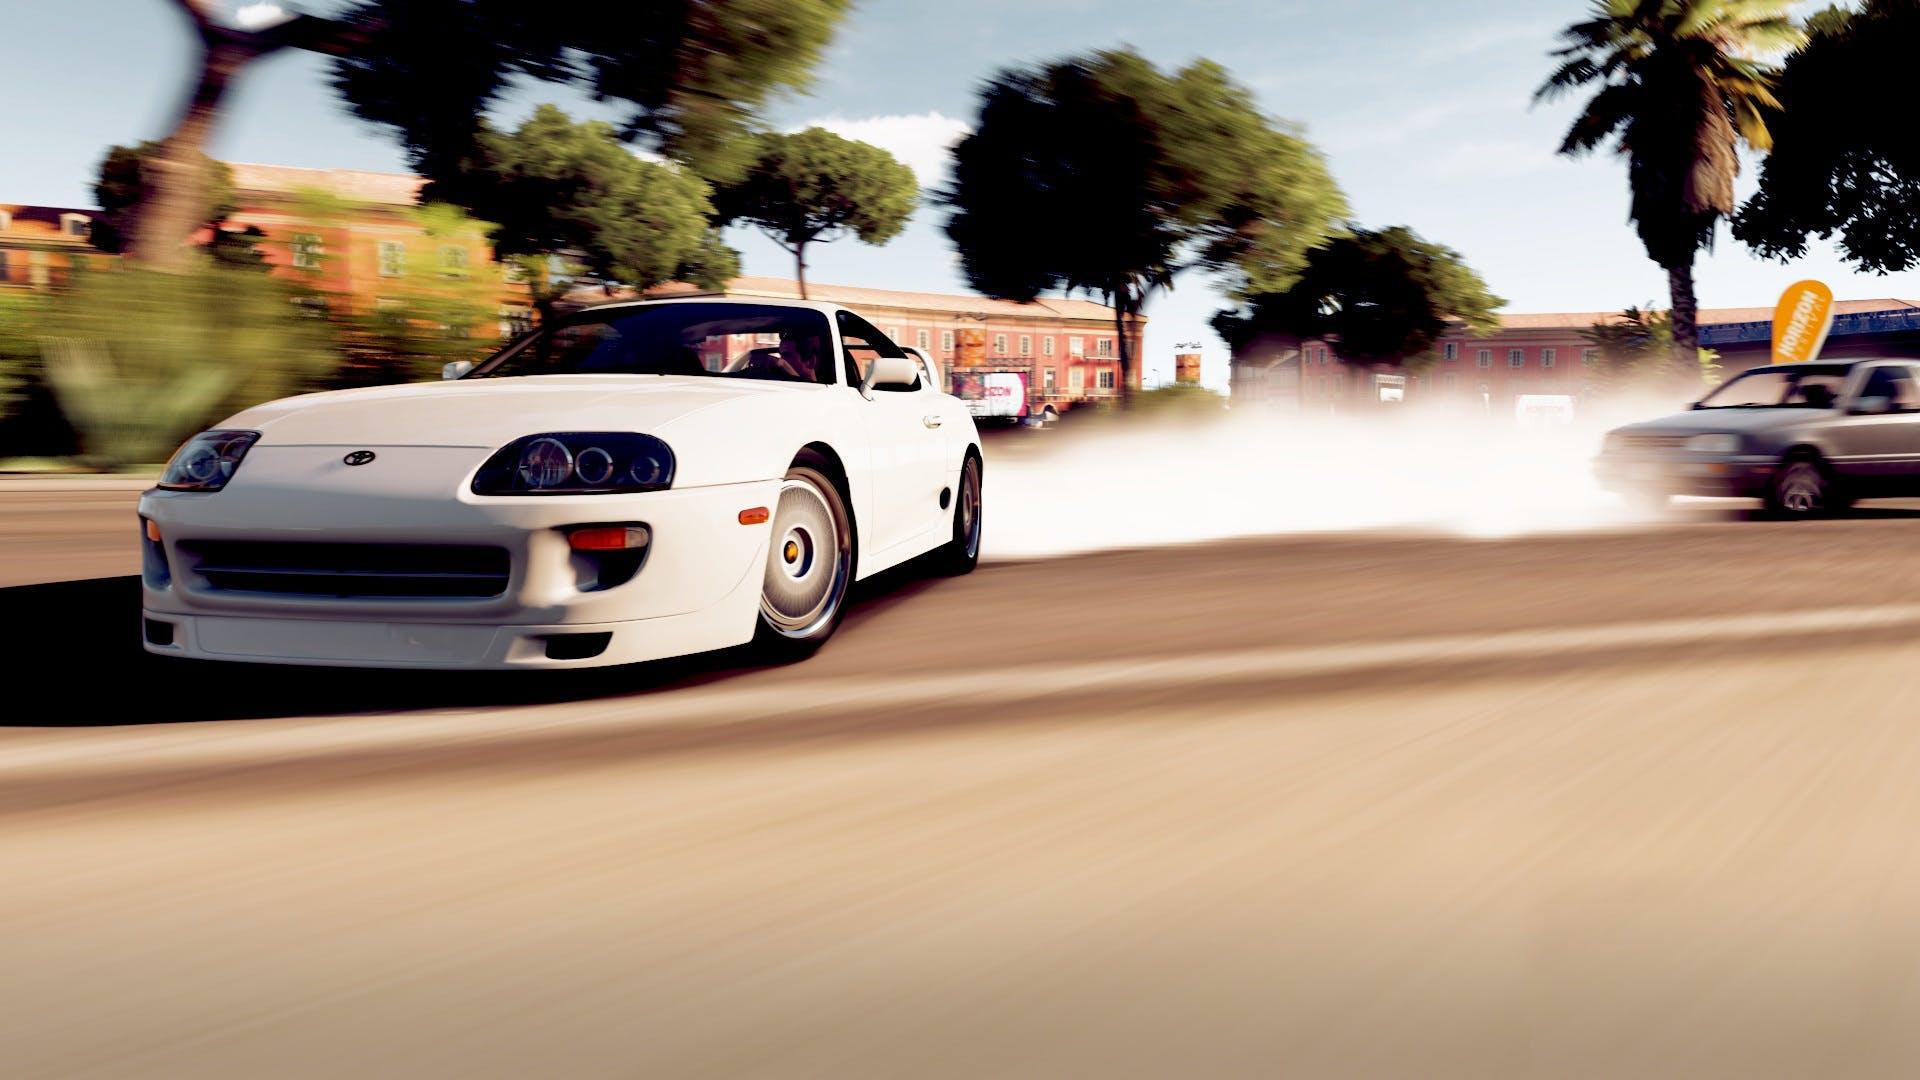 action, asphalt, auto racing